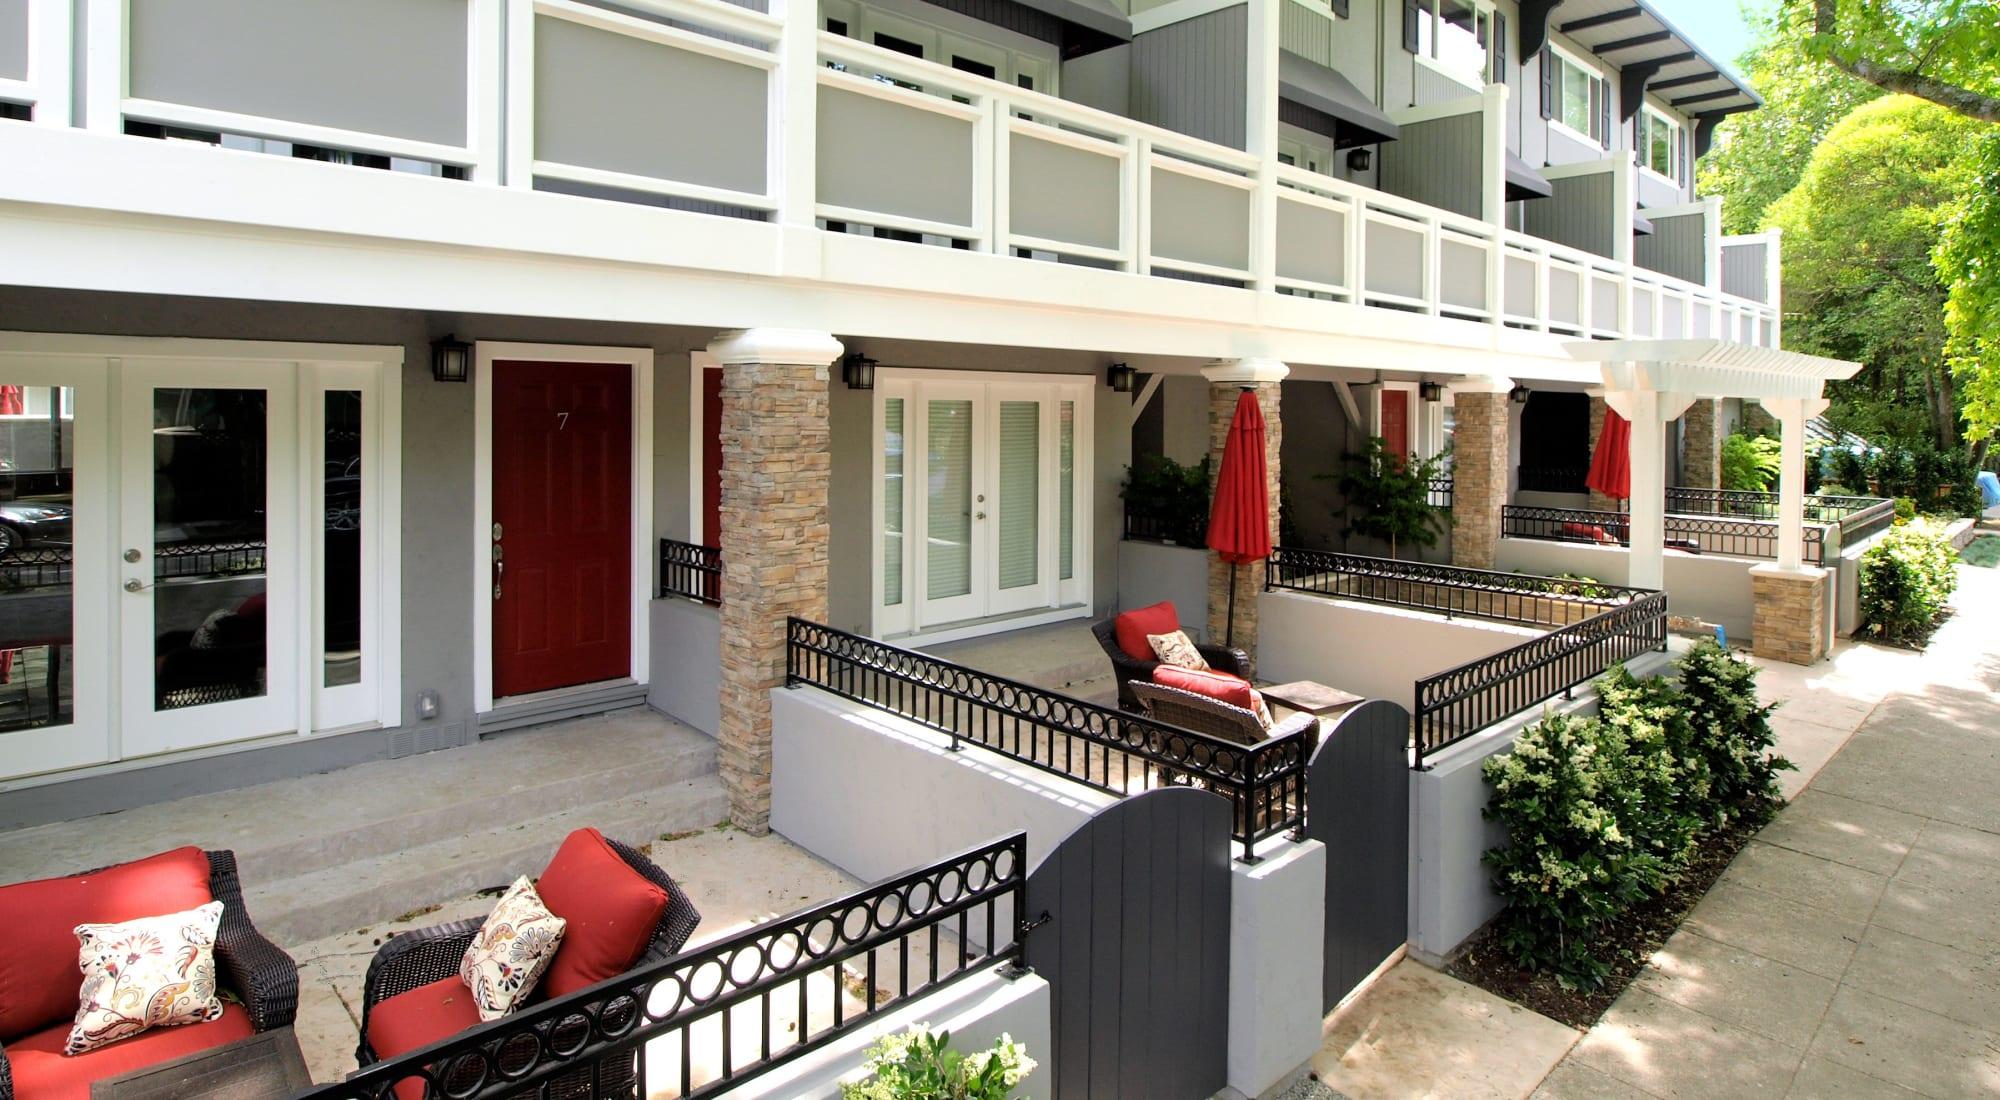 35 Tam luxury apartments in San Anselmo, California